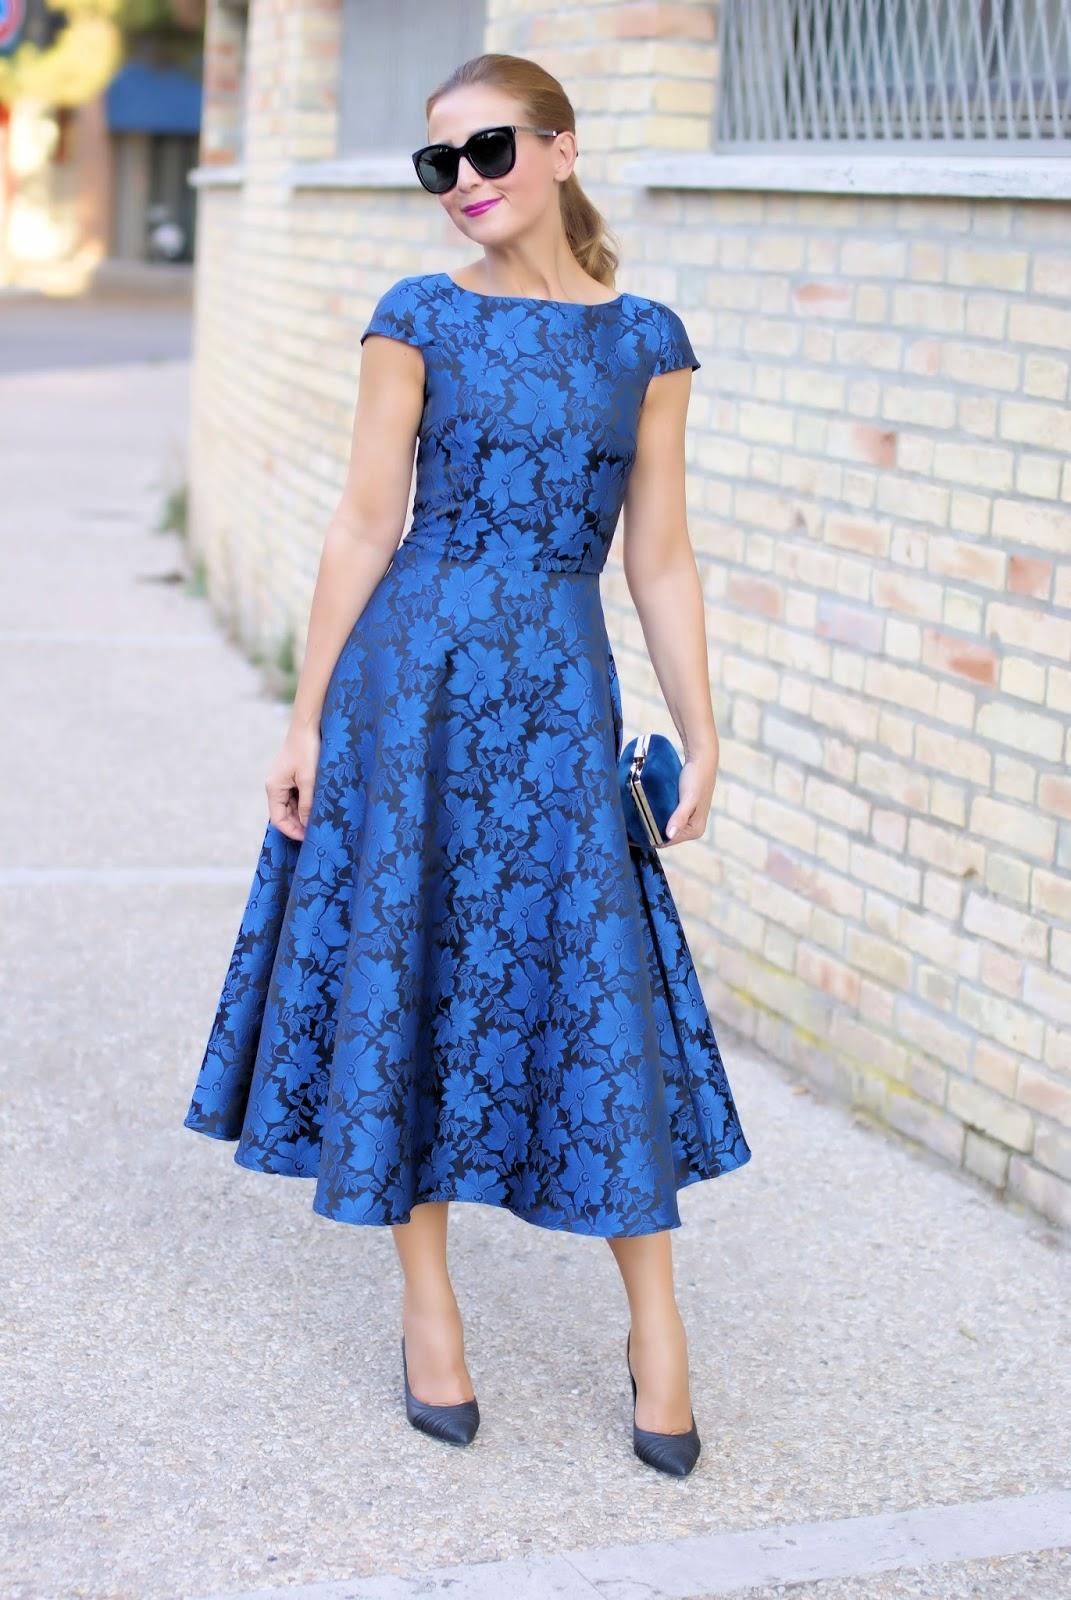 Blue elegant jacquard midi dress | Fashion and Cookies - fashion and beauty blog